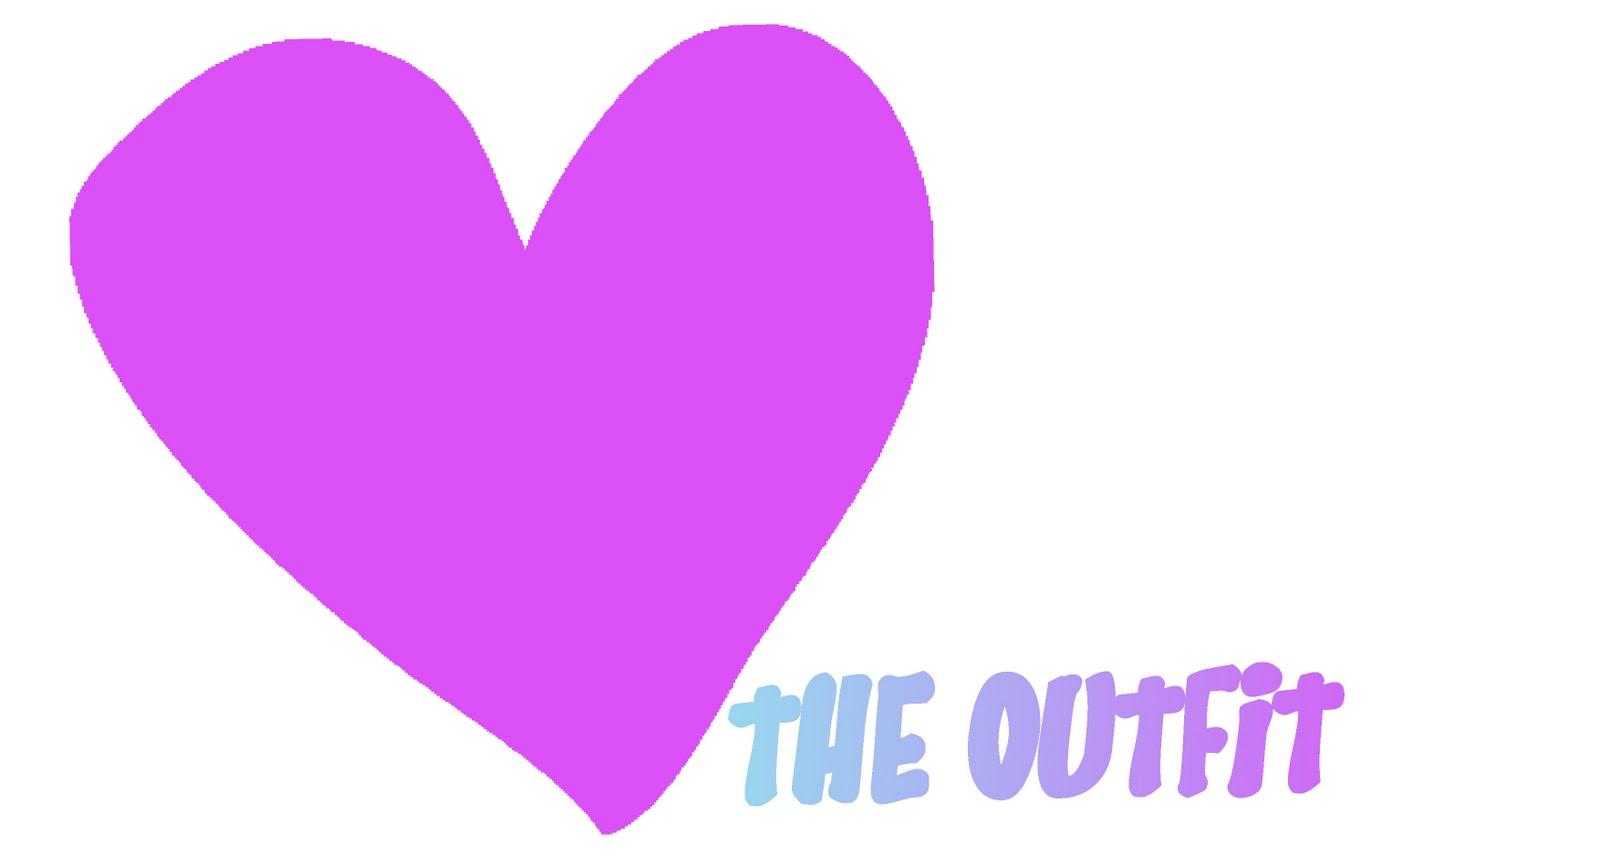 http://3.bp.blogspot.com/_bWh_mXIyDMw/TQfHueatHbI/AAAAAAAADo4/--ZbtEiHzik/s1600/Love+the+outfit.jpg